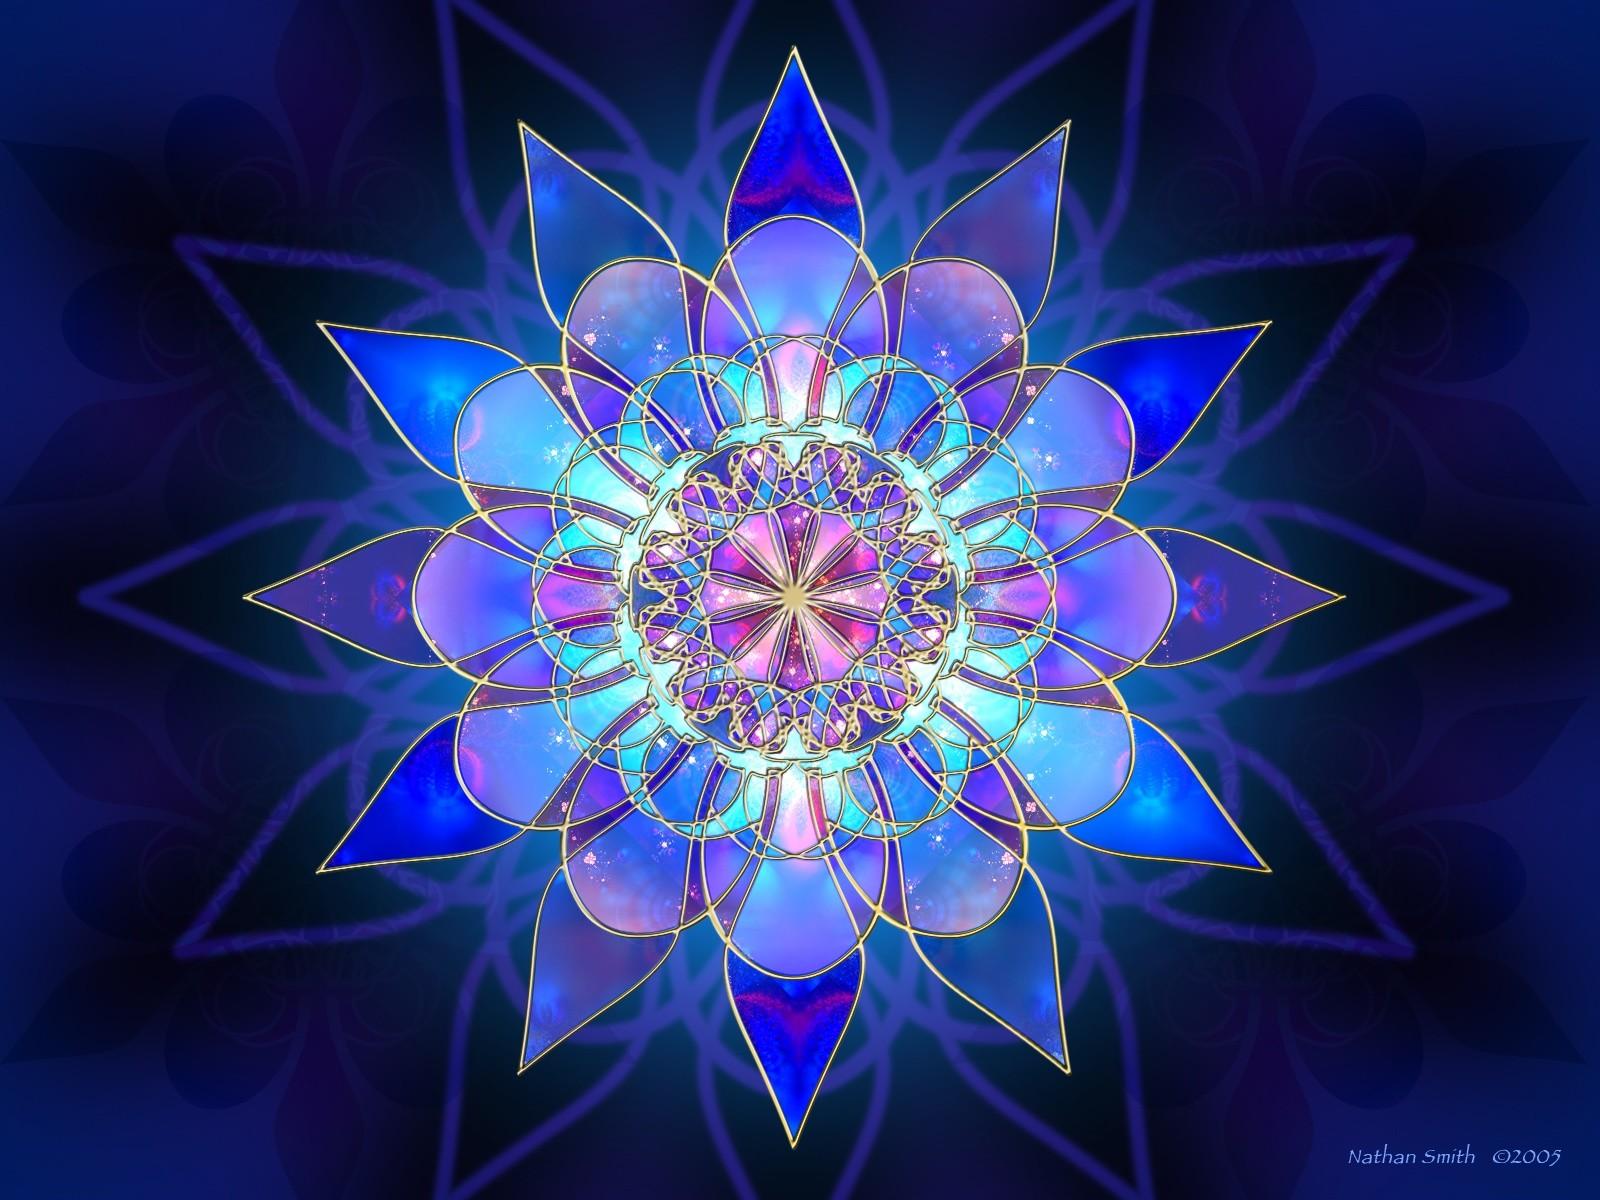 Cosmic Fantasy Fractal Blacklight: Fractal